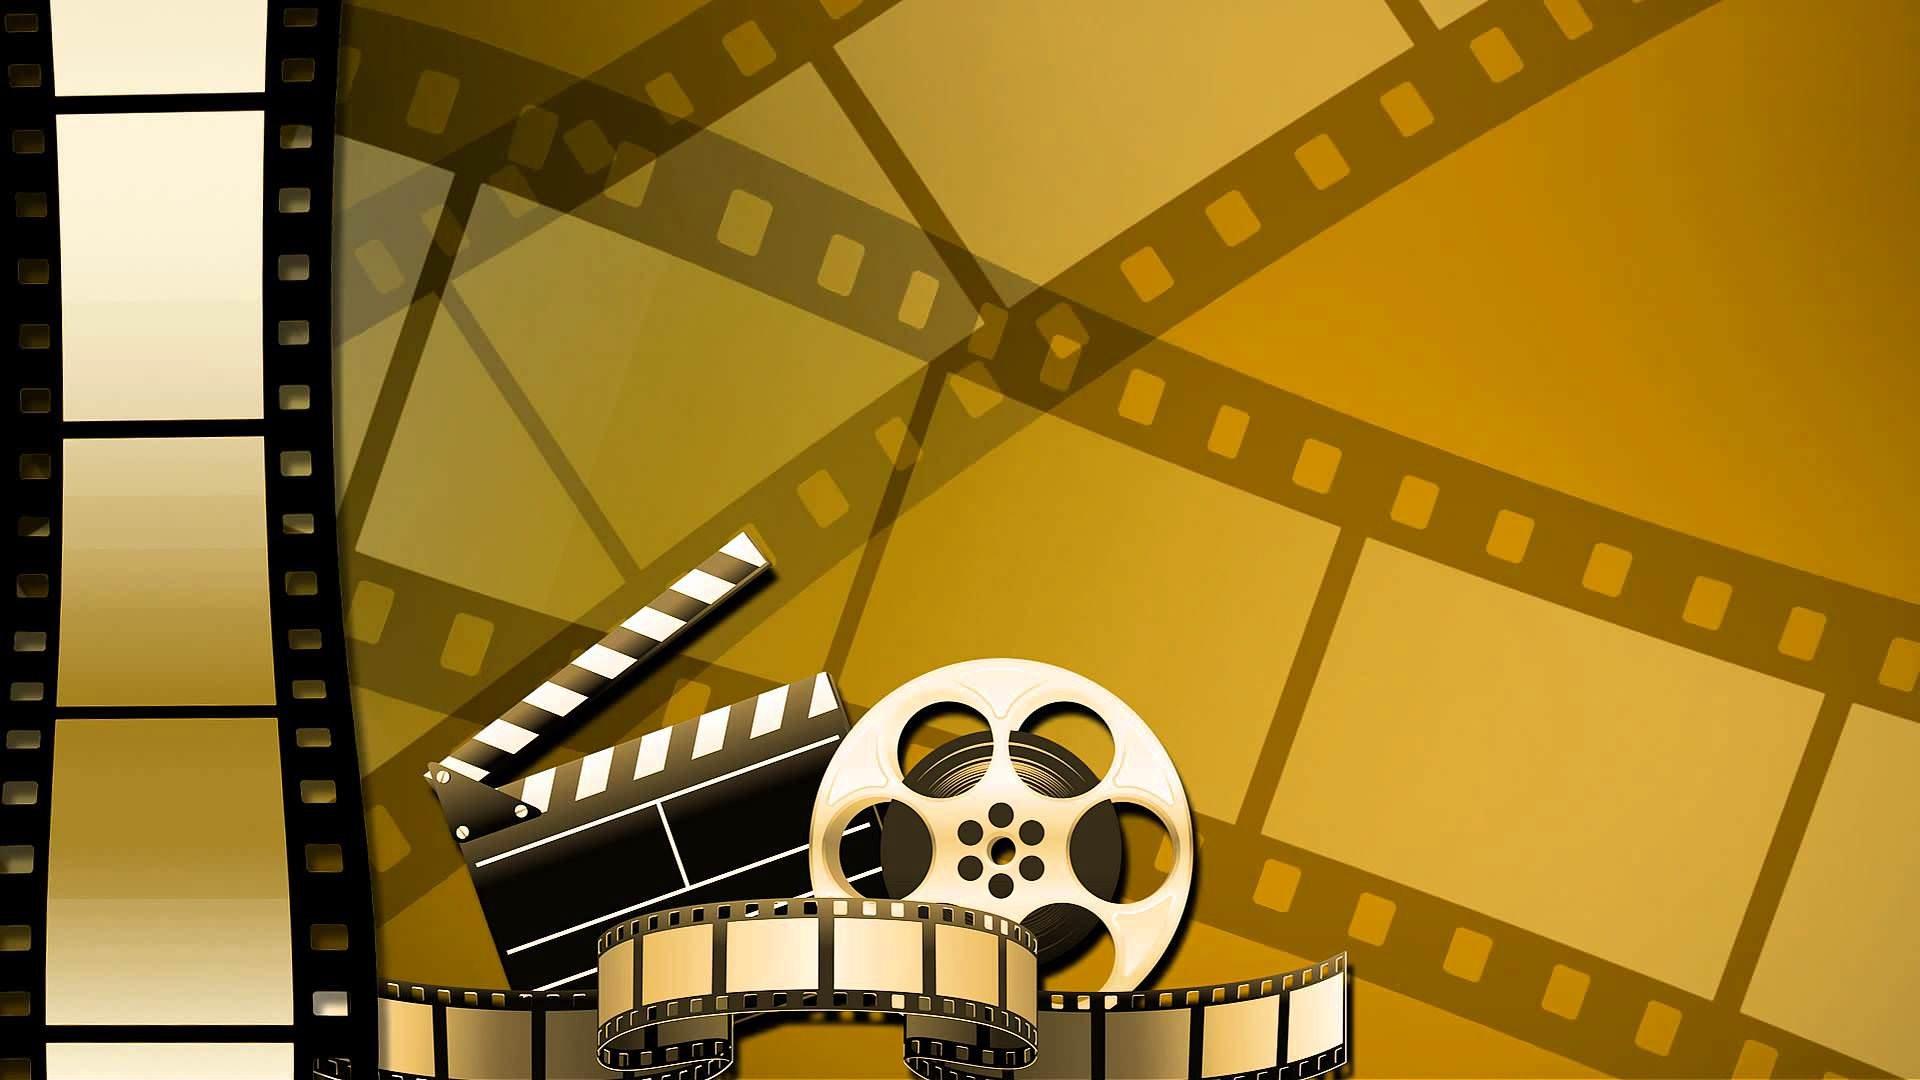 Картинка на тему кино